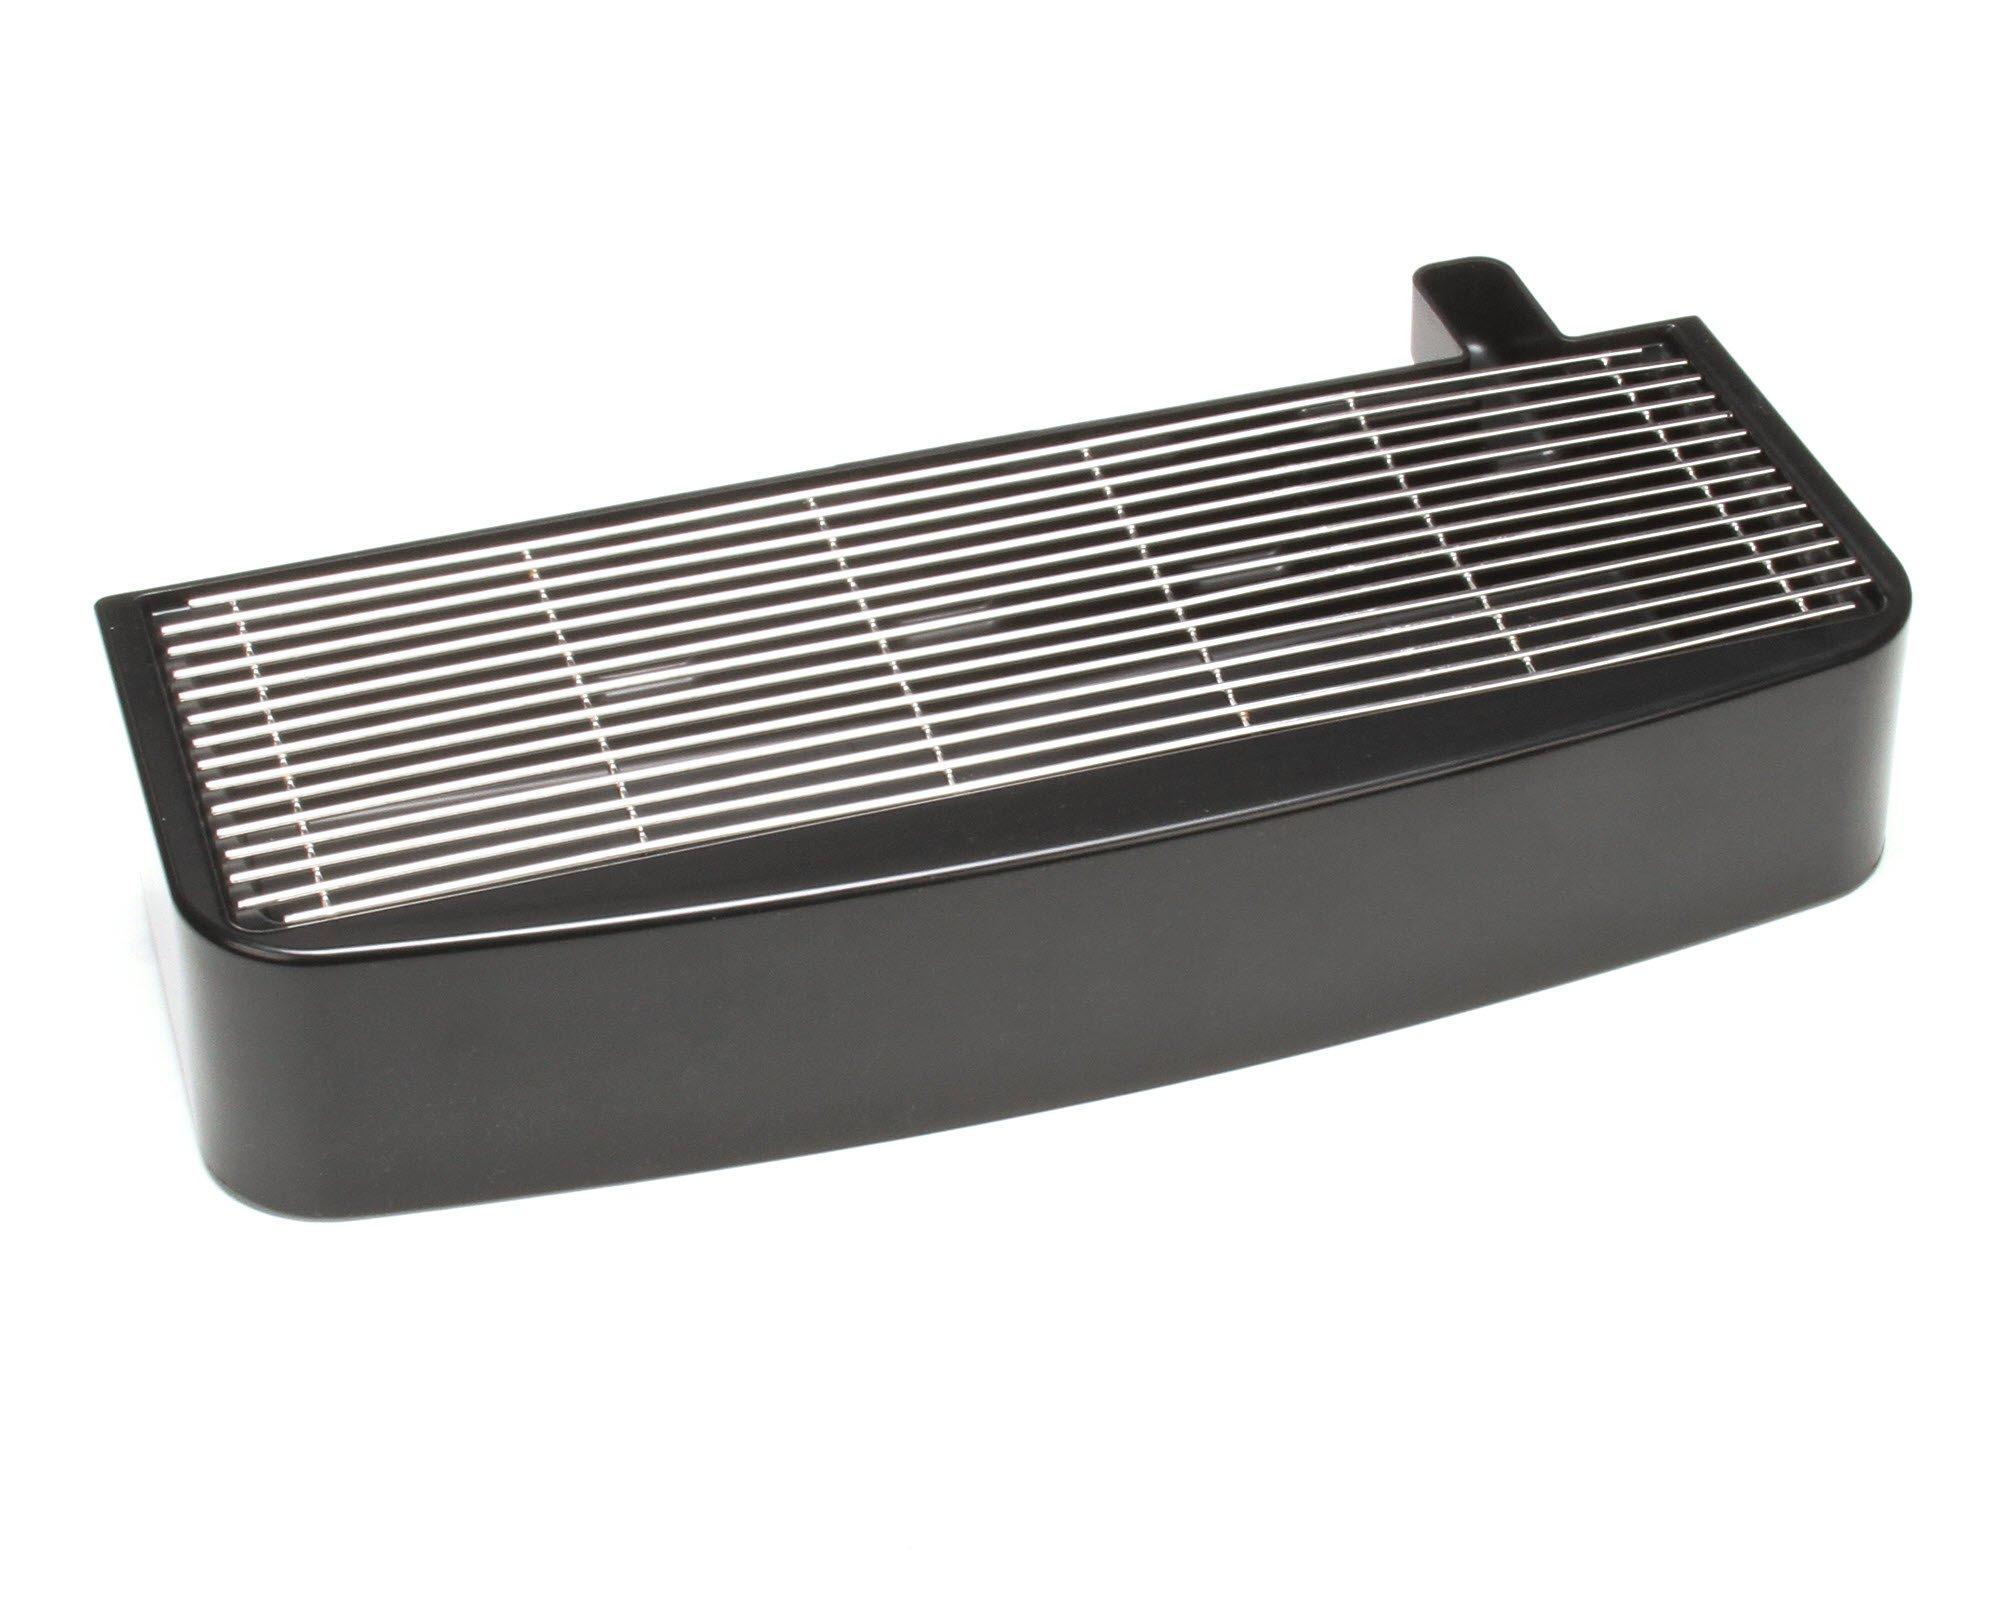 Bunn 38764.1001 Complete Jdf4S/Lcr3 Drip Tray by Bunn (Image #1)